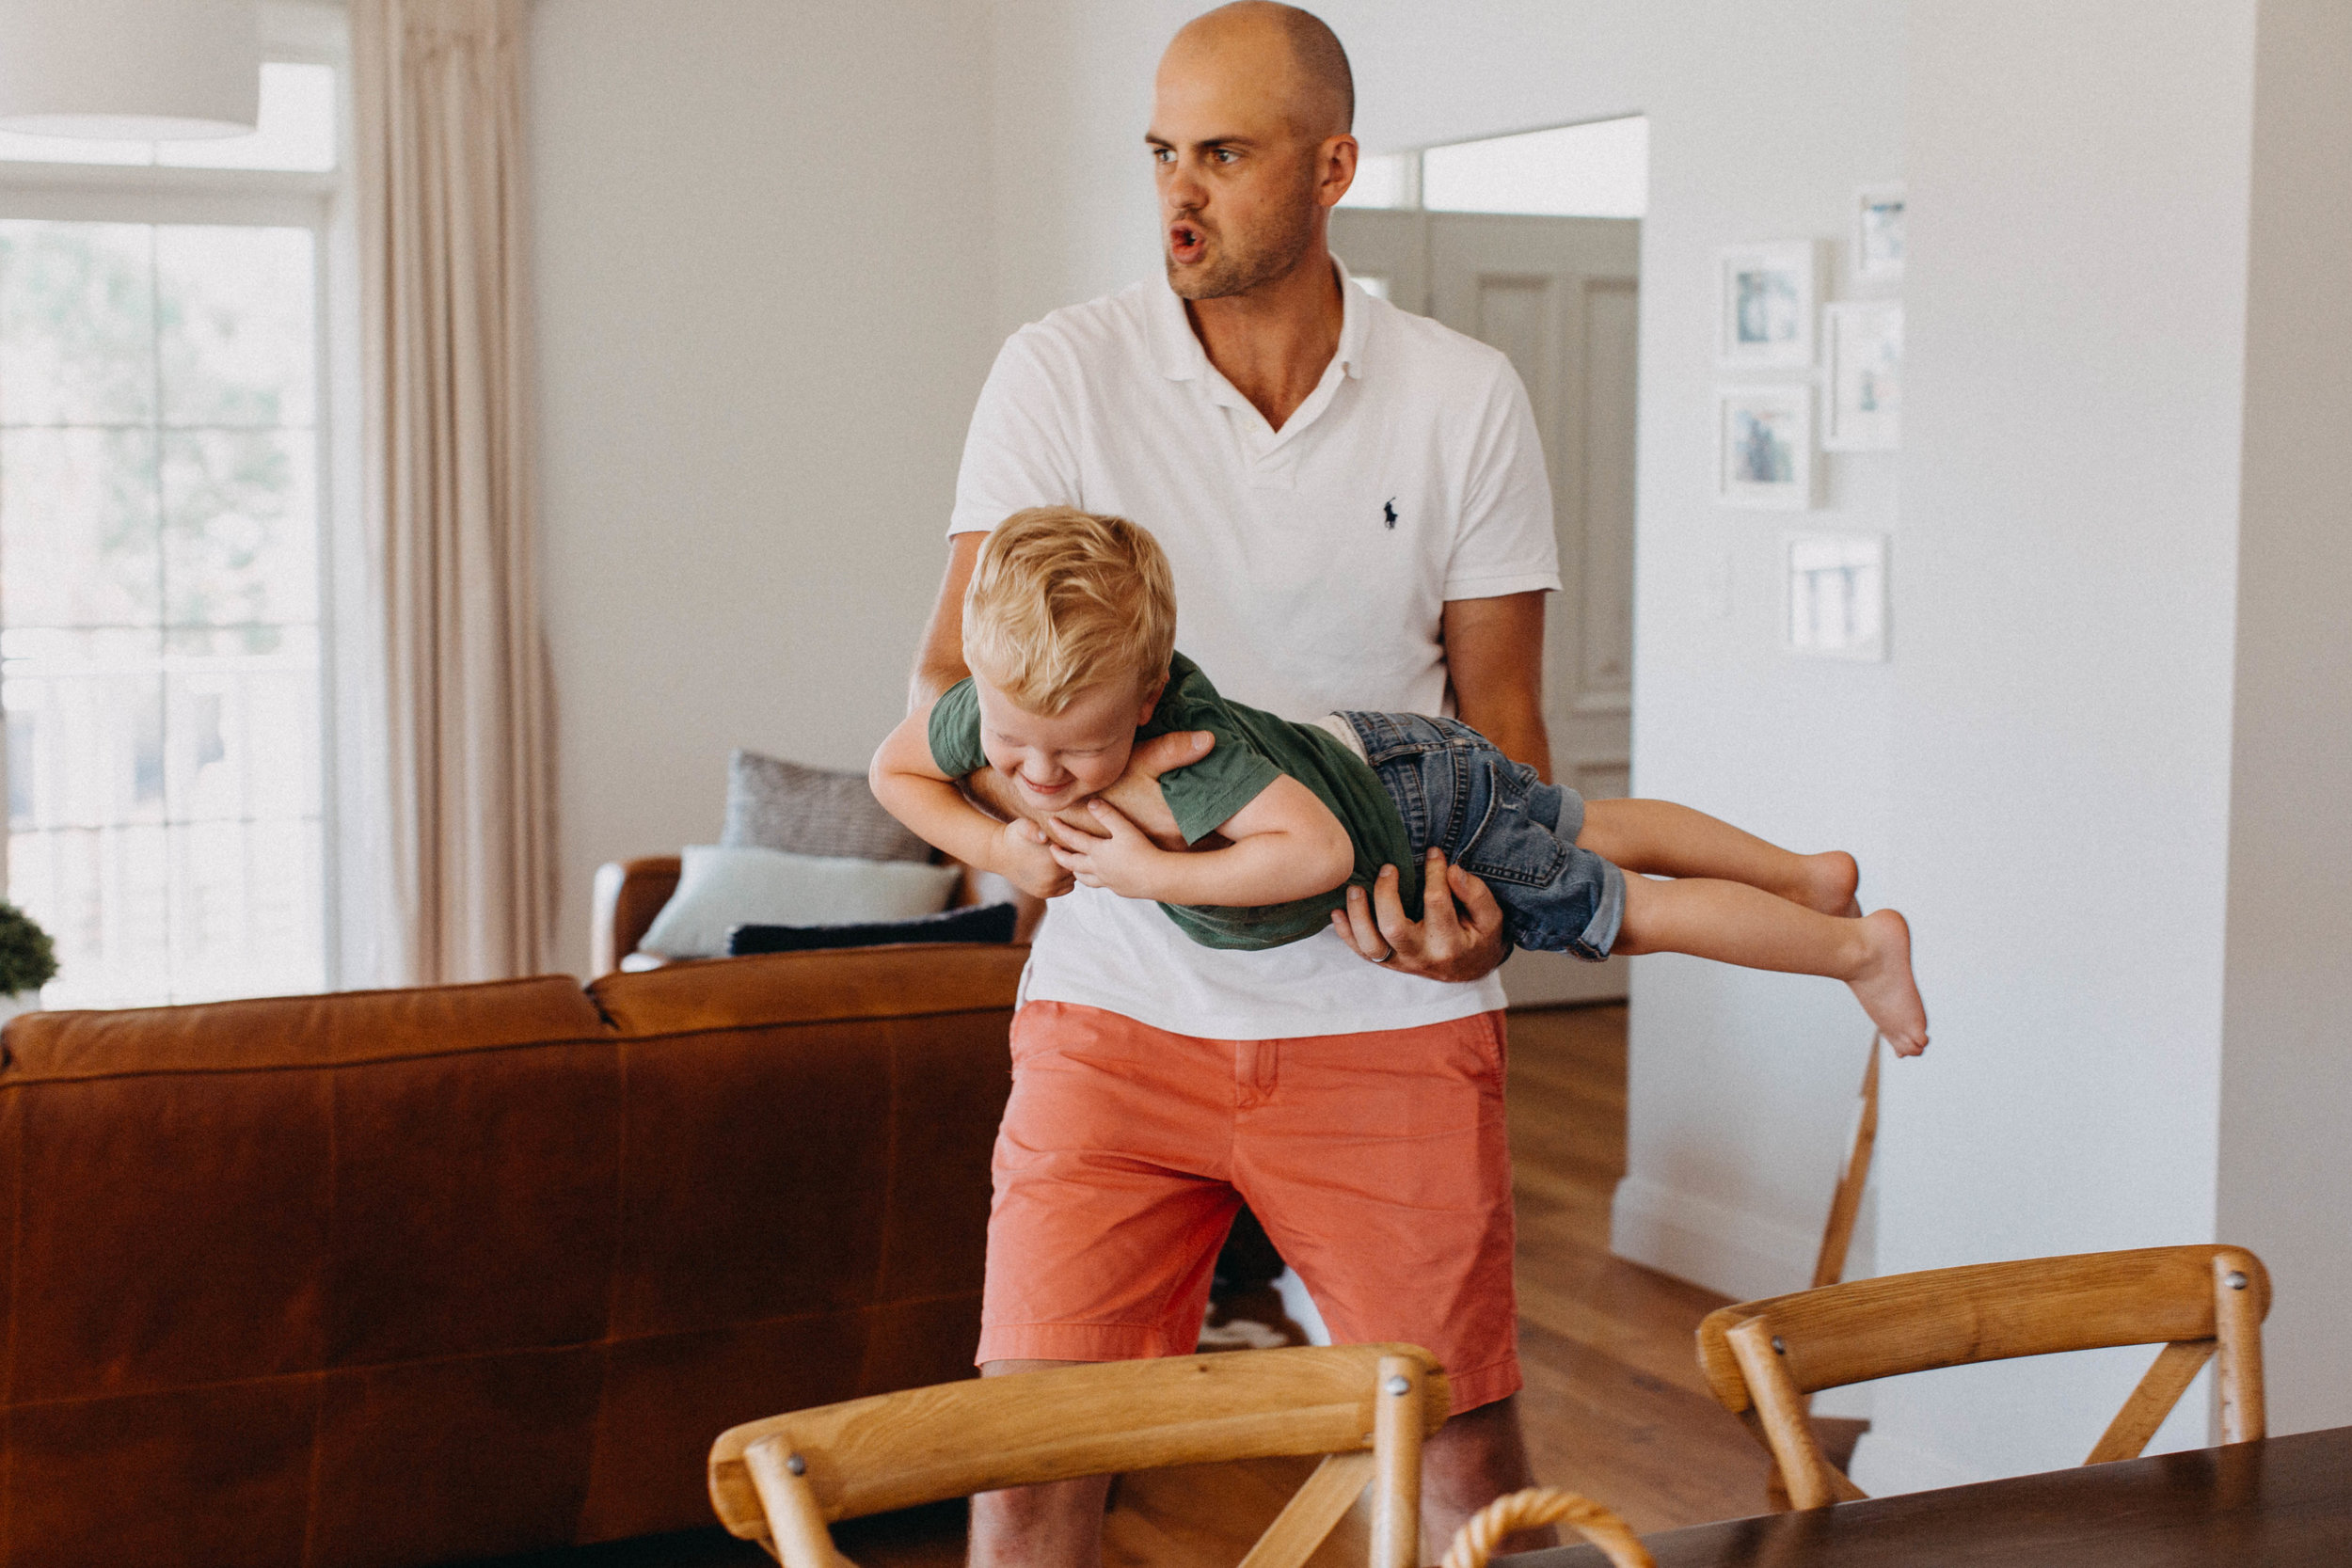 family-photography-picton-lifestyle-www.emilyobrienphotography.net-17.jpg